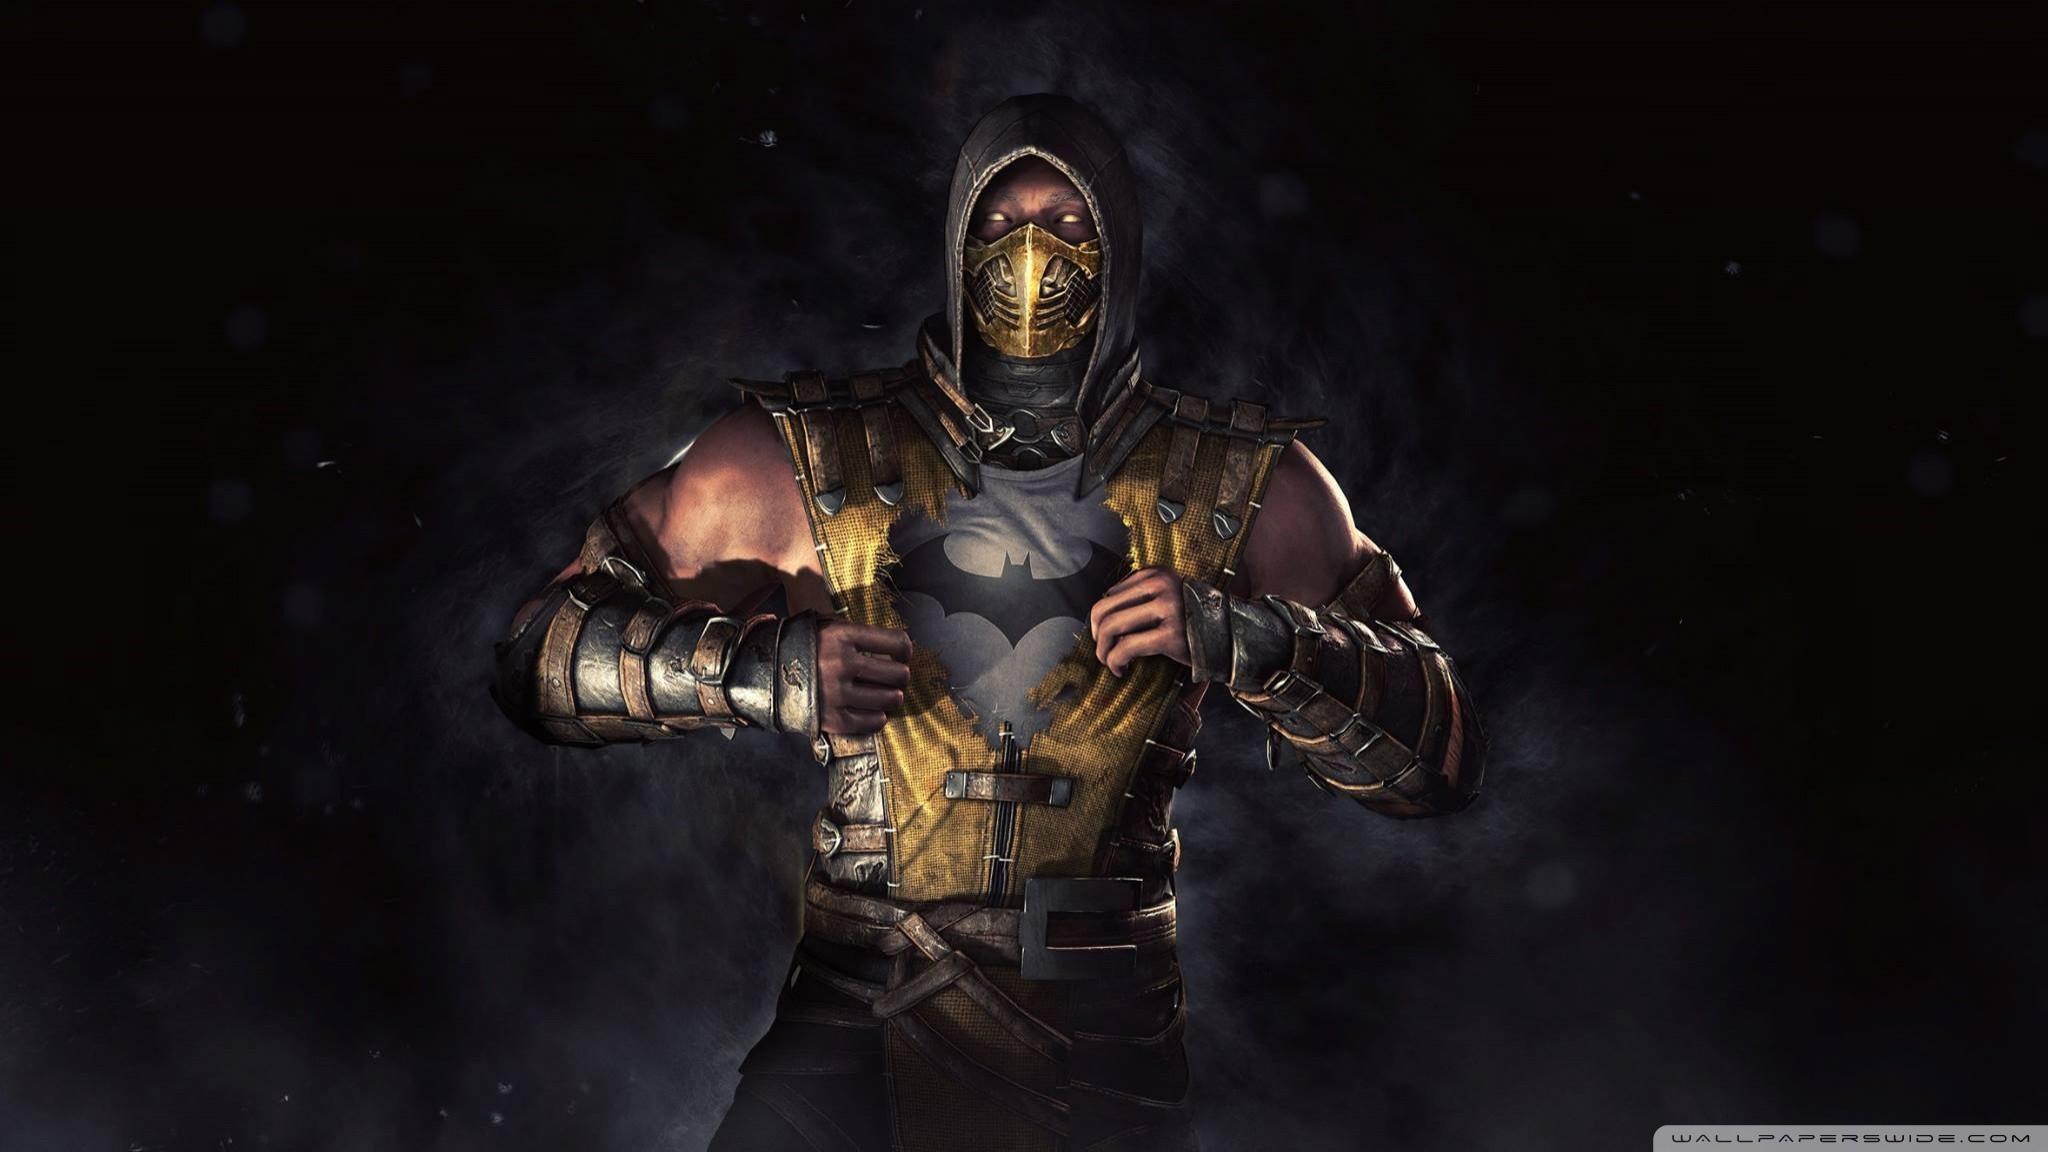 Mortal Kombat 9 Scorpion Wallpaper 72 images 2048x1152